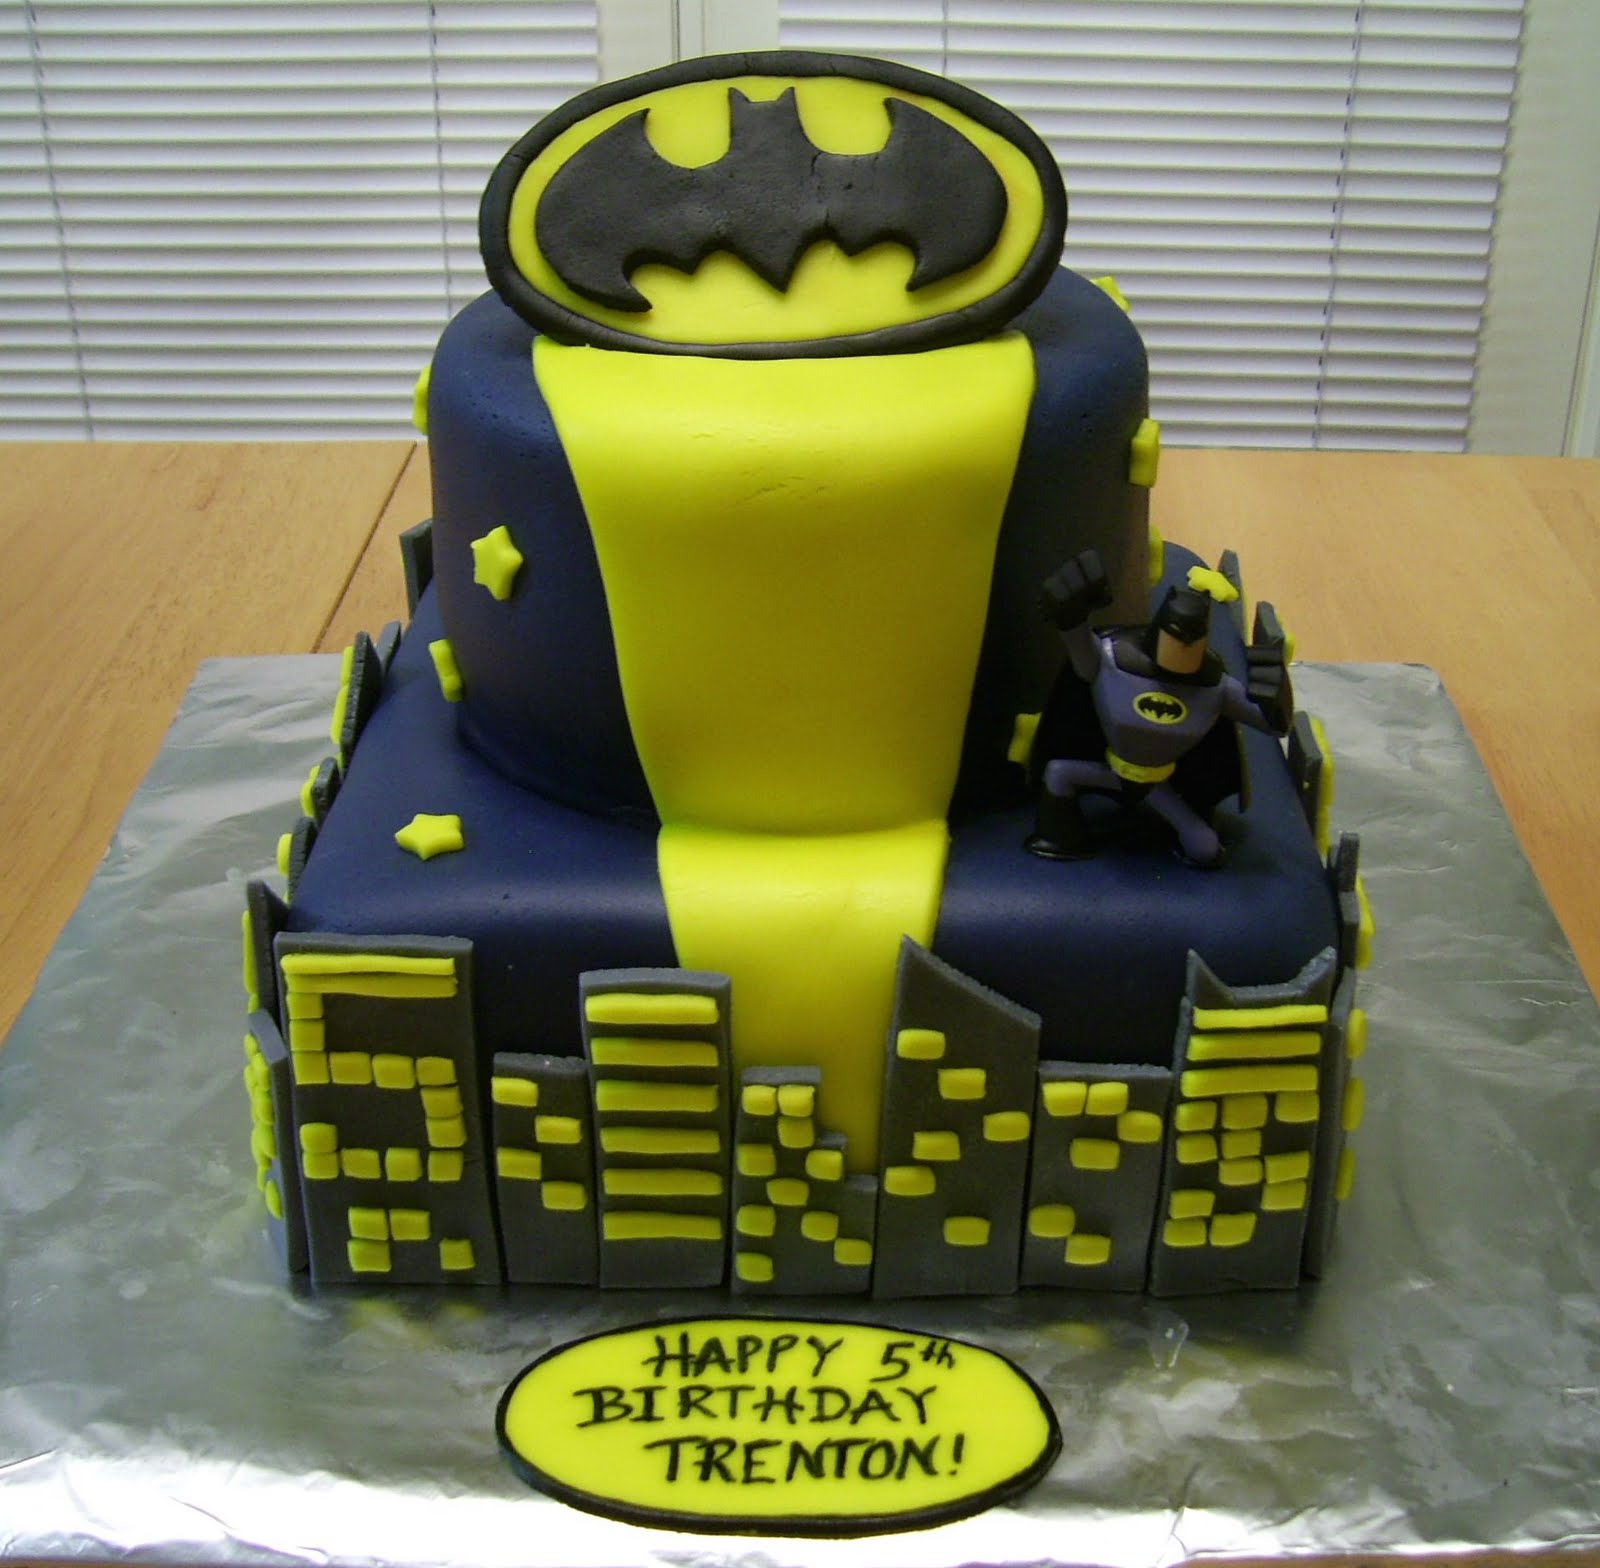 Astonishing Batman Cakes Decoration Ideas Little Birthday Cakes Personalised Birthday Cards Cominlily Jamesorg